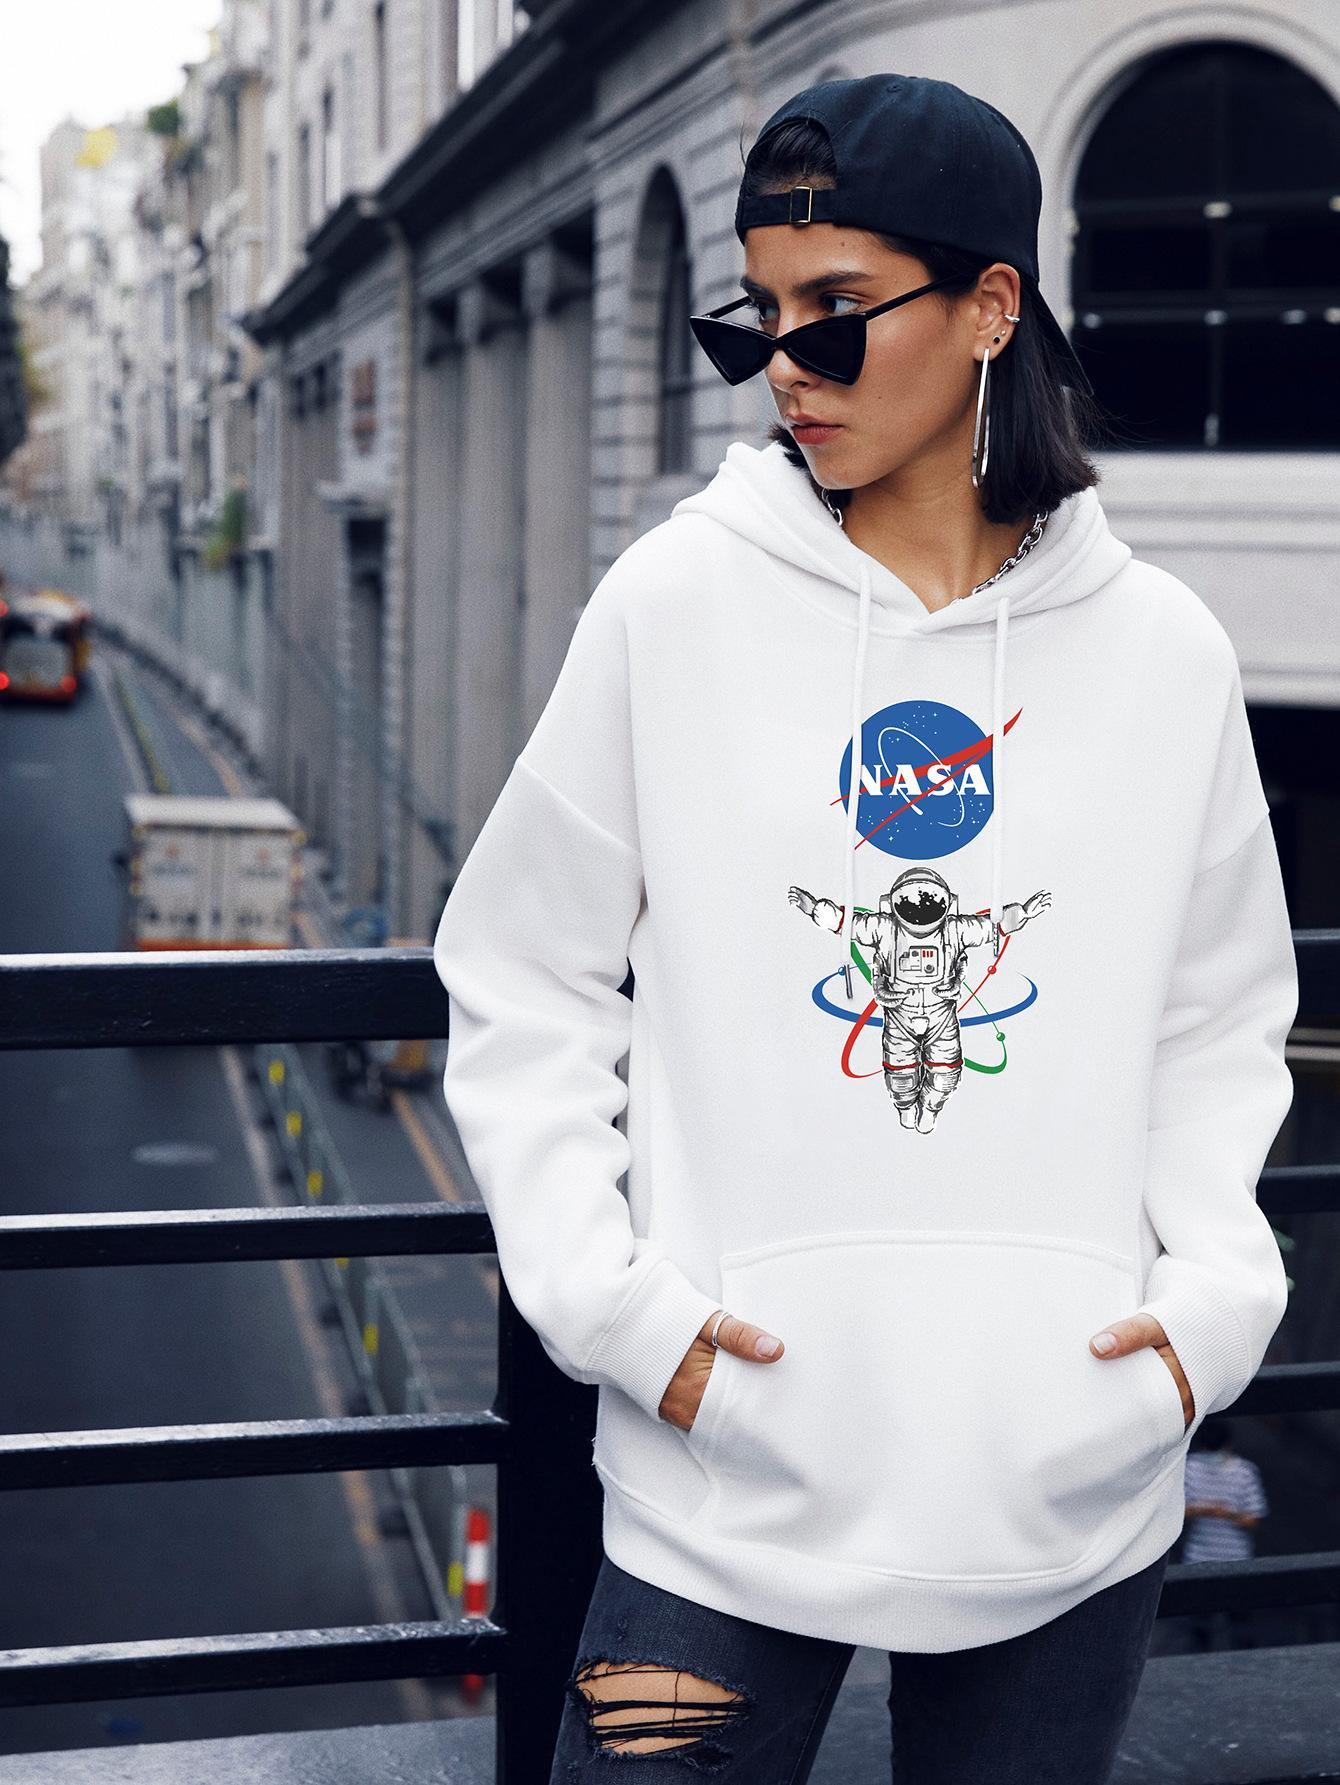 autumn and winter women's popular astronaut street casual hooded sweater NSSN1863